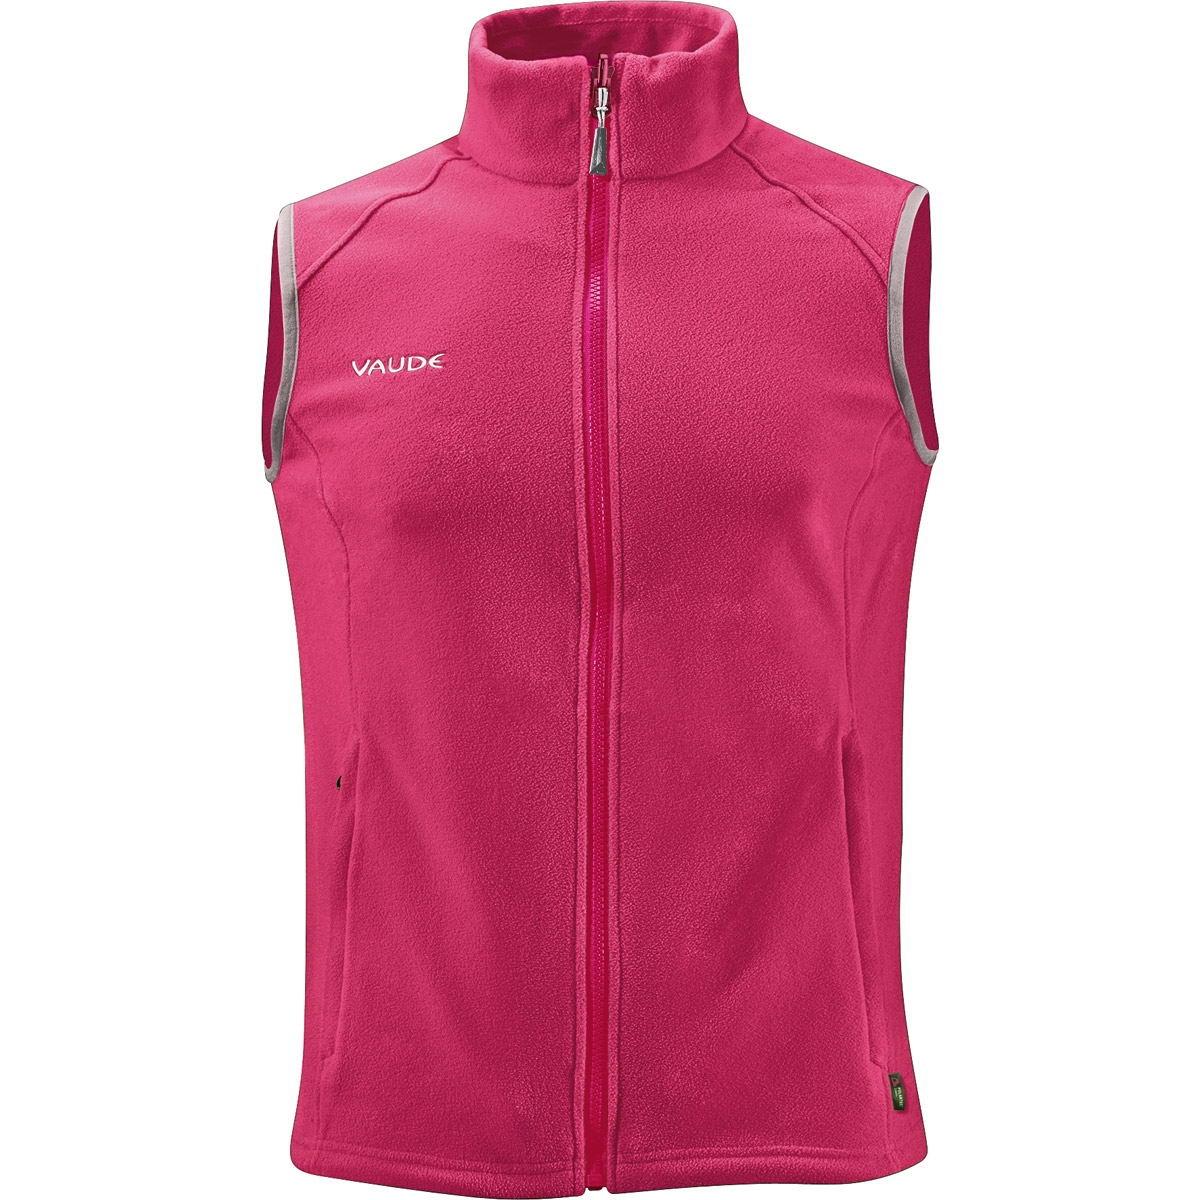 VAUDE  Sonderangebote –  Women's Snake River Vest II – Fleeceweste nun mit 40  % Rabatt für 35.95 € im Angebot